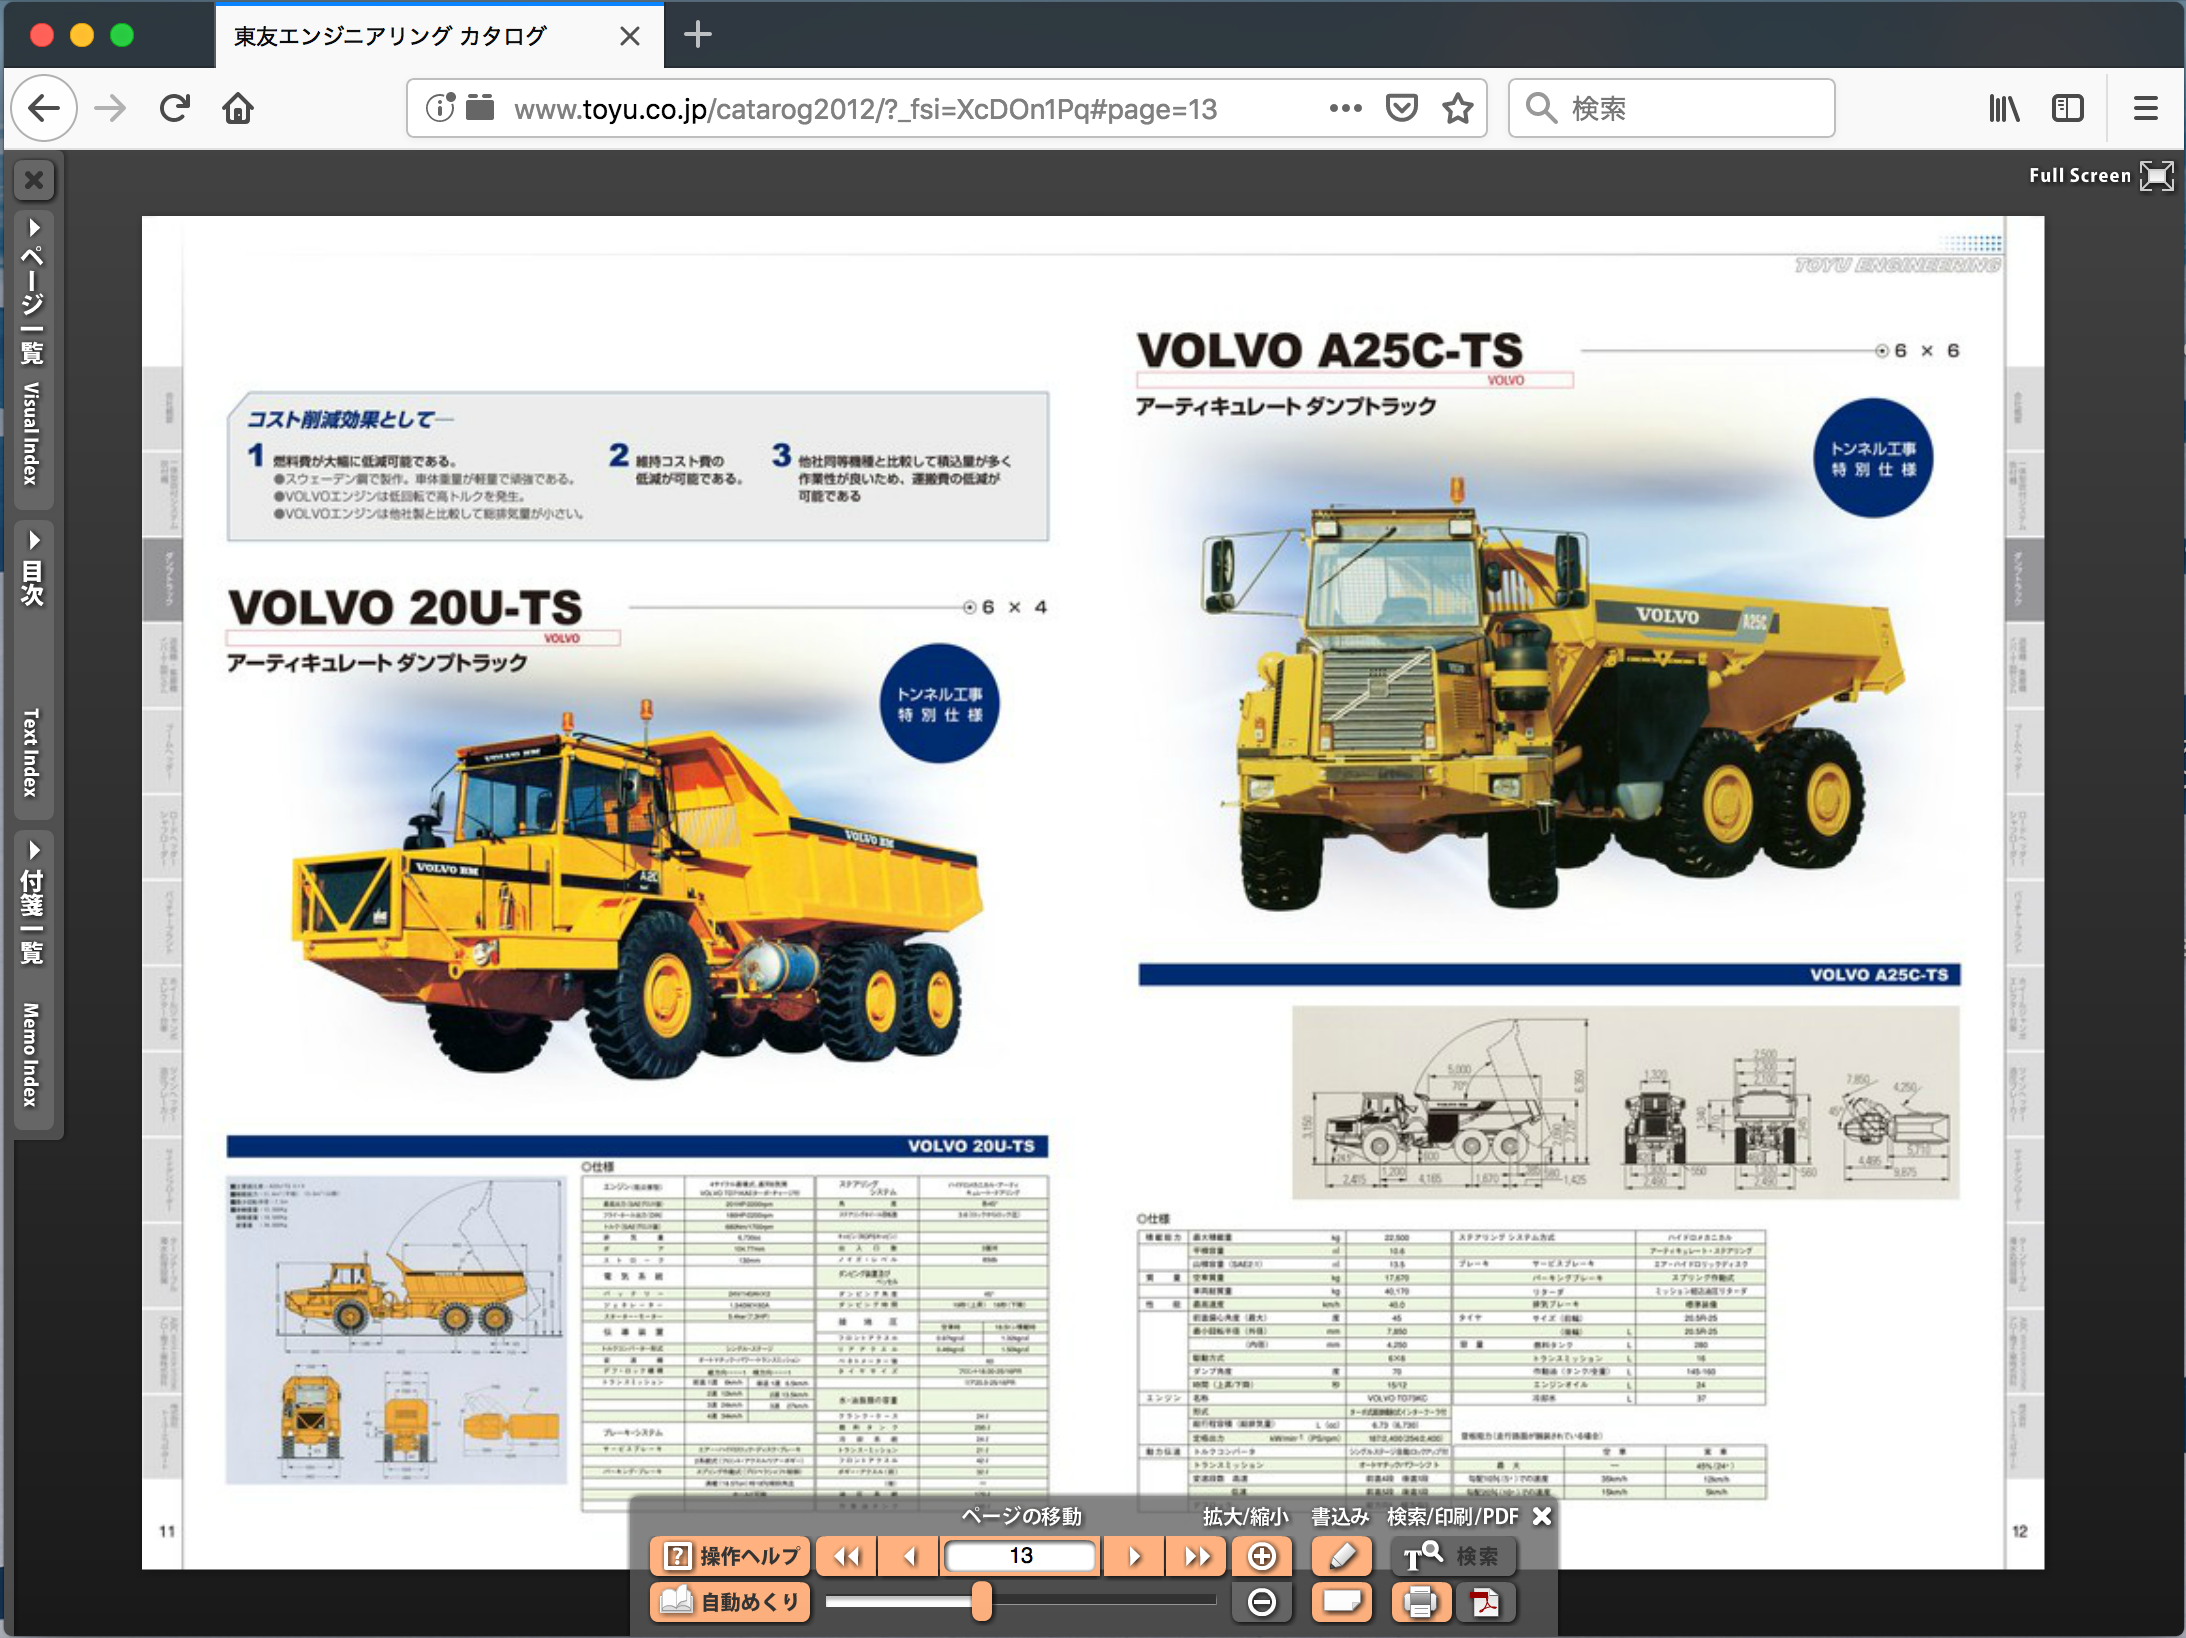 eカタログの製品情報ページ